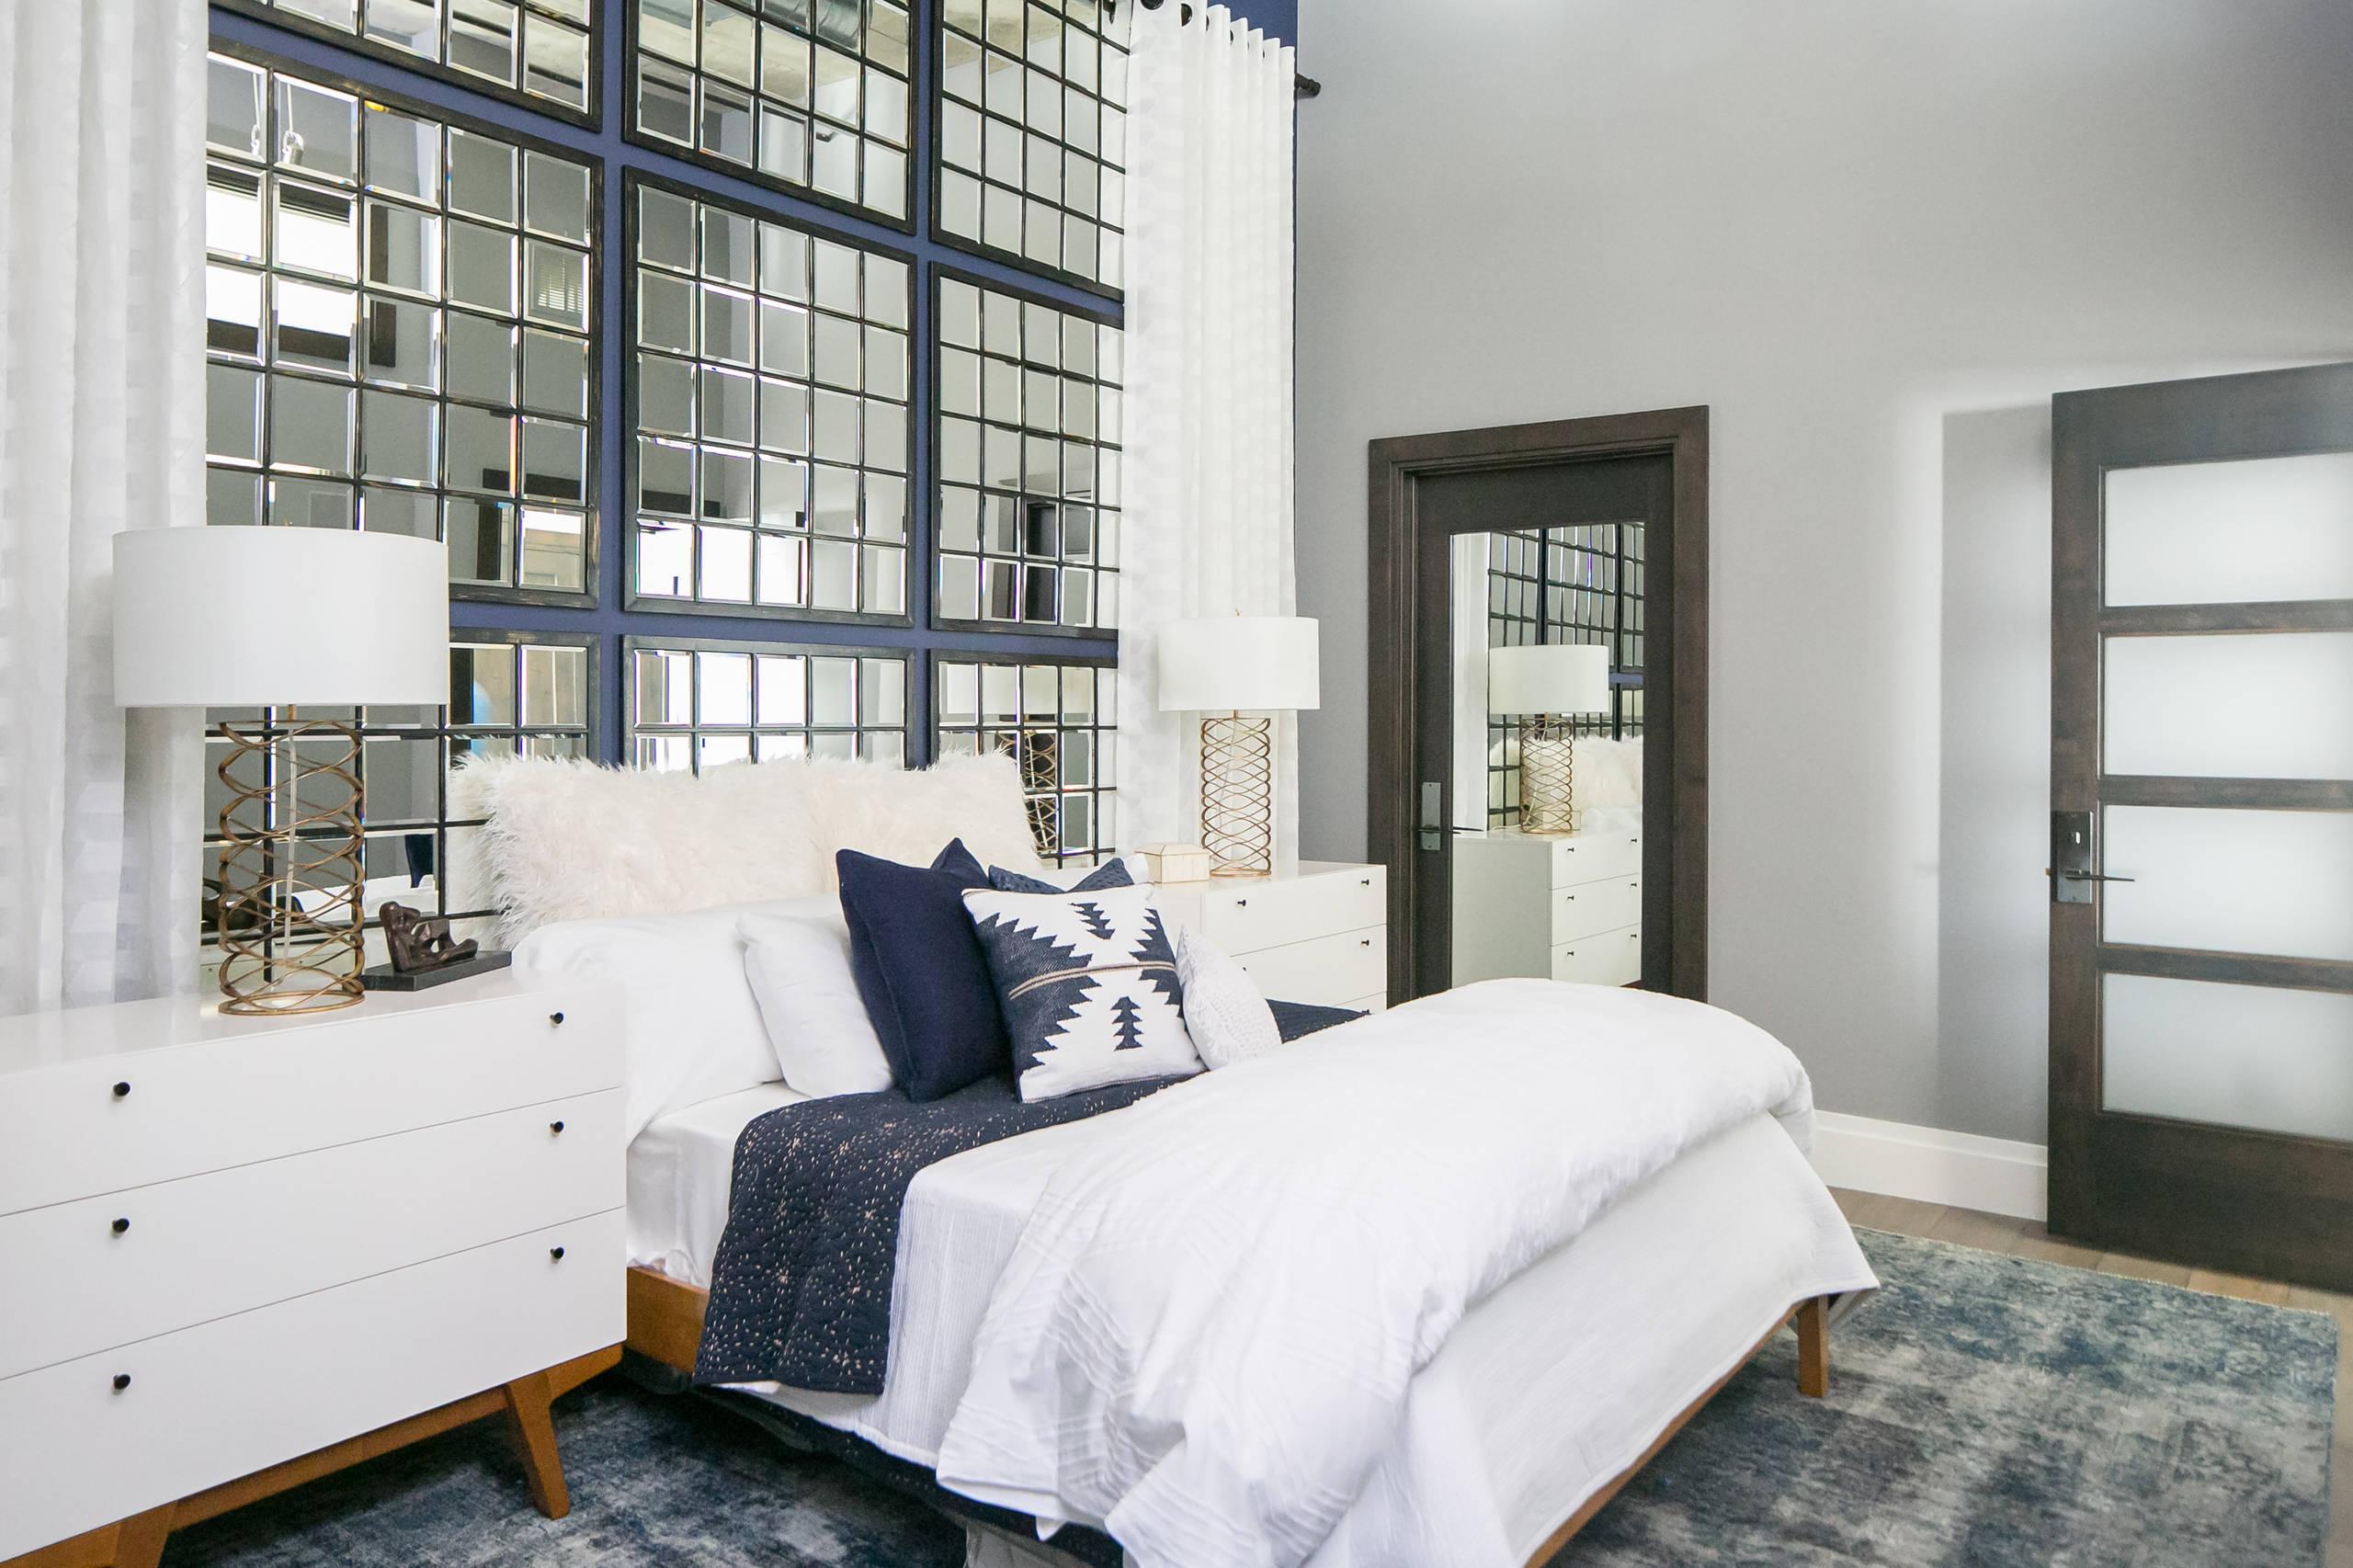 Denver Colorado Residence | Bedroom